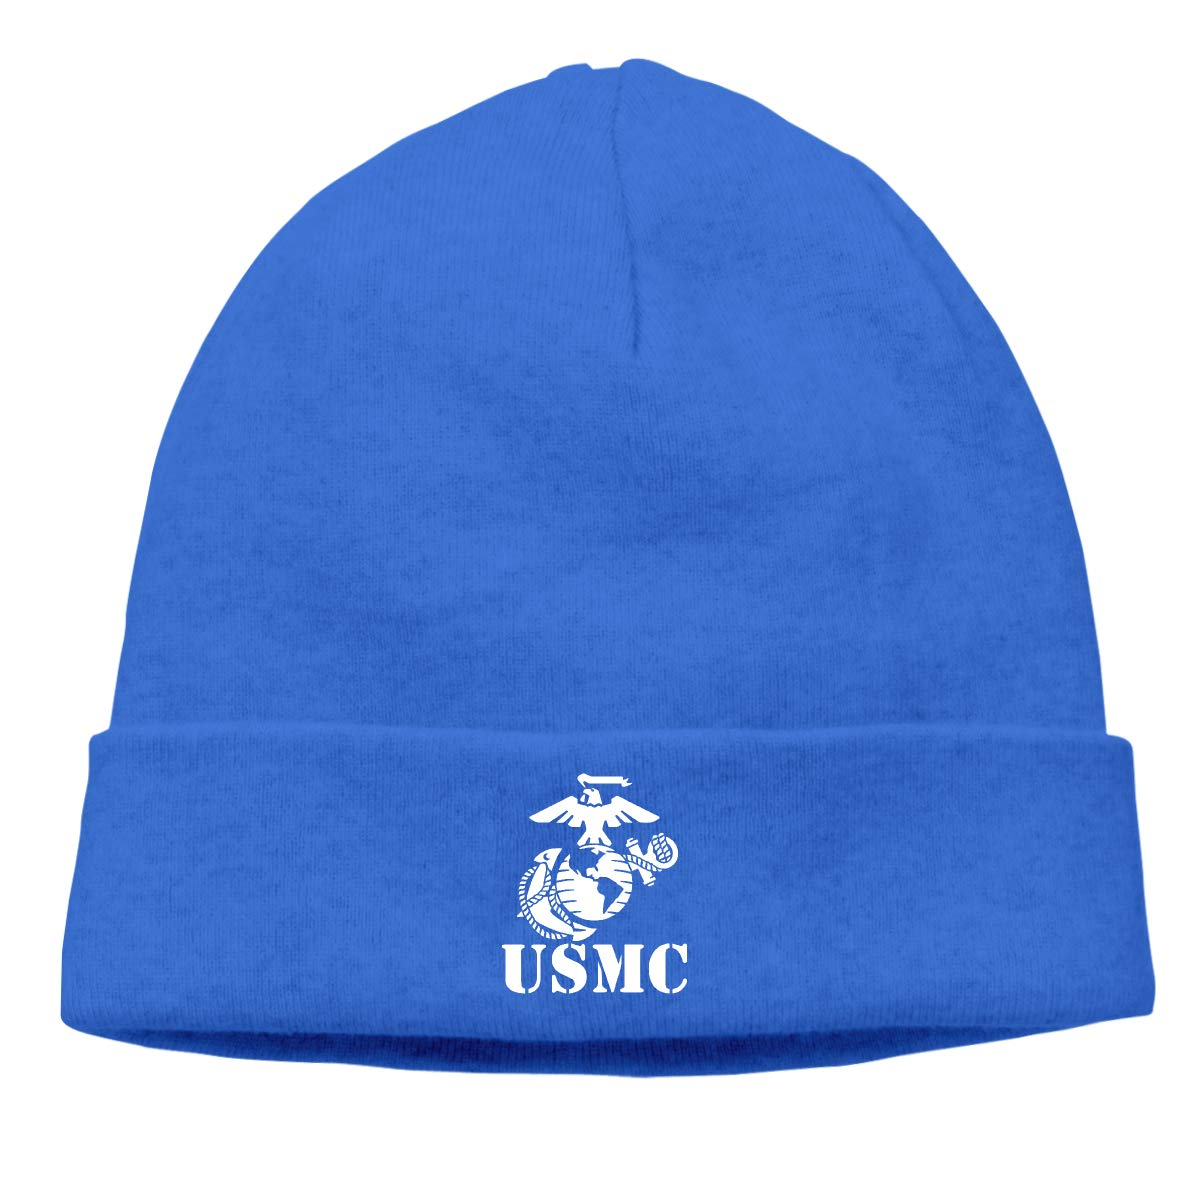 njsdi USMC Marine Corps Men Winter Summer Stretchy /& Soft Slouchy Beanie Hat